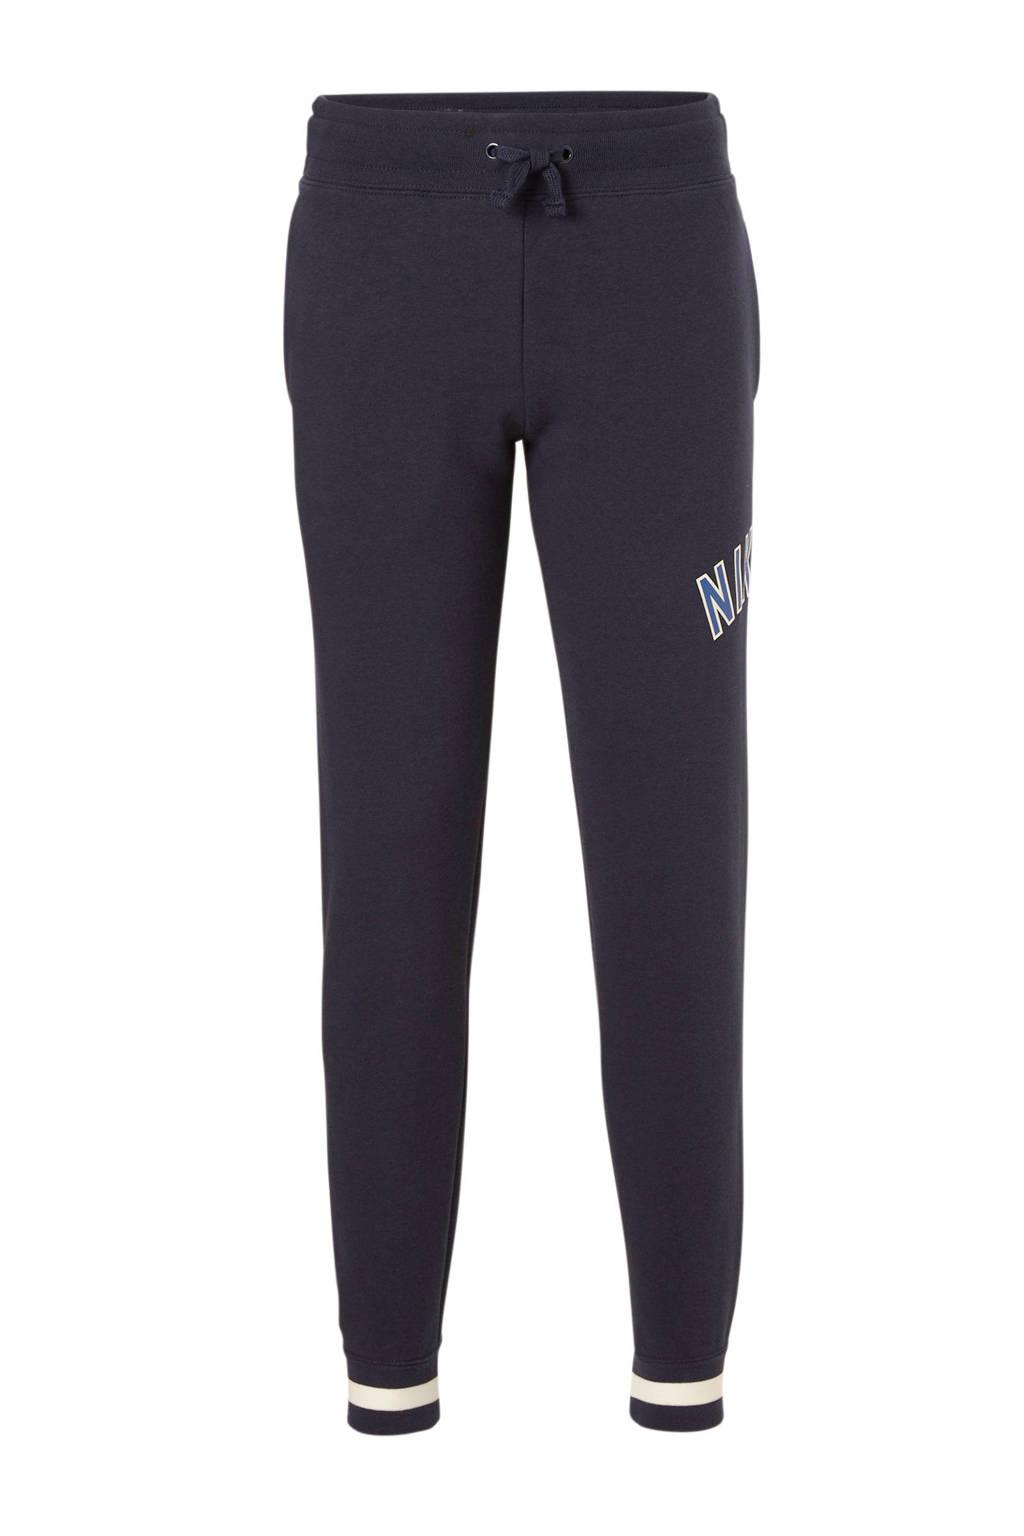 Nike   joggingbroek donkerblauw, Donkerblauw